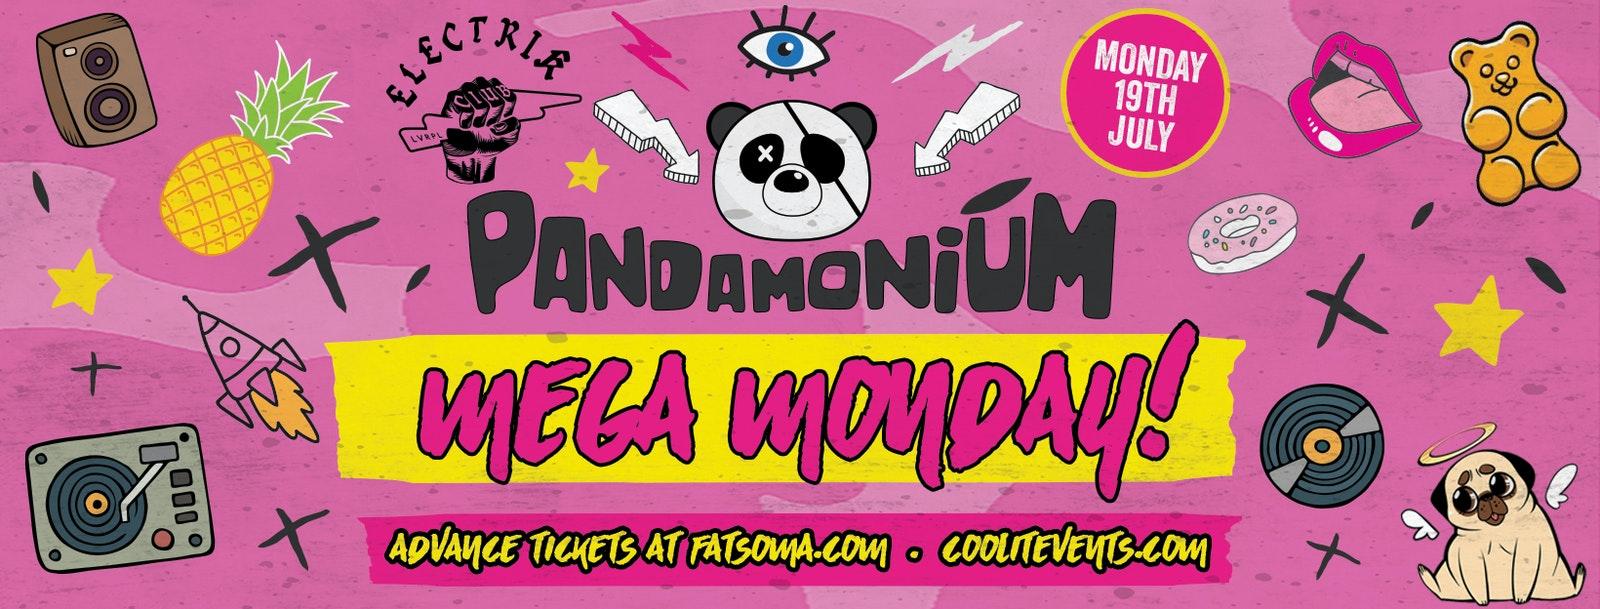 Pandamonium Mega Monday!